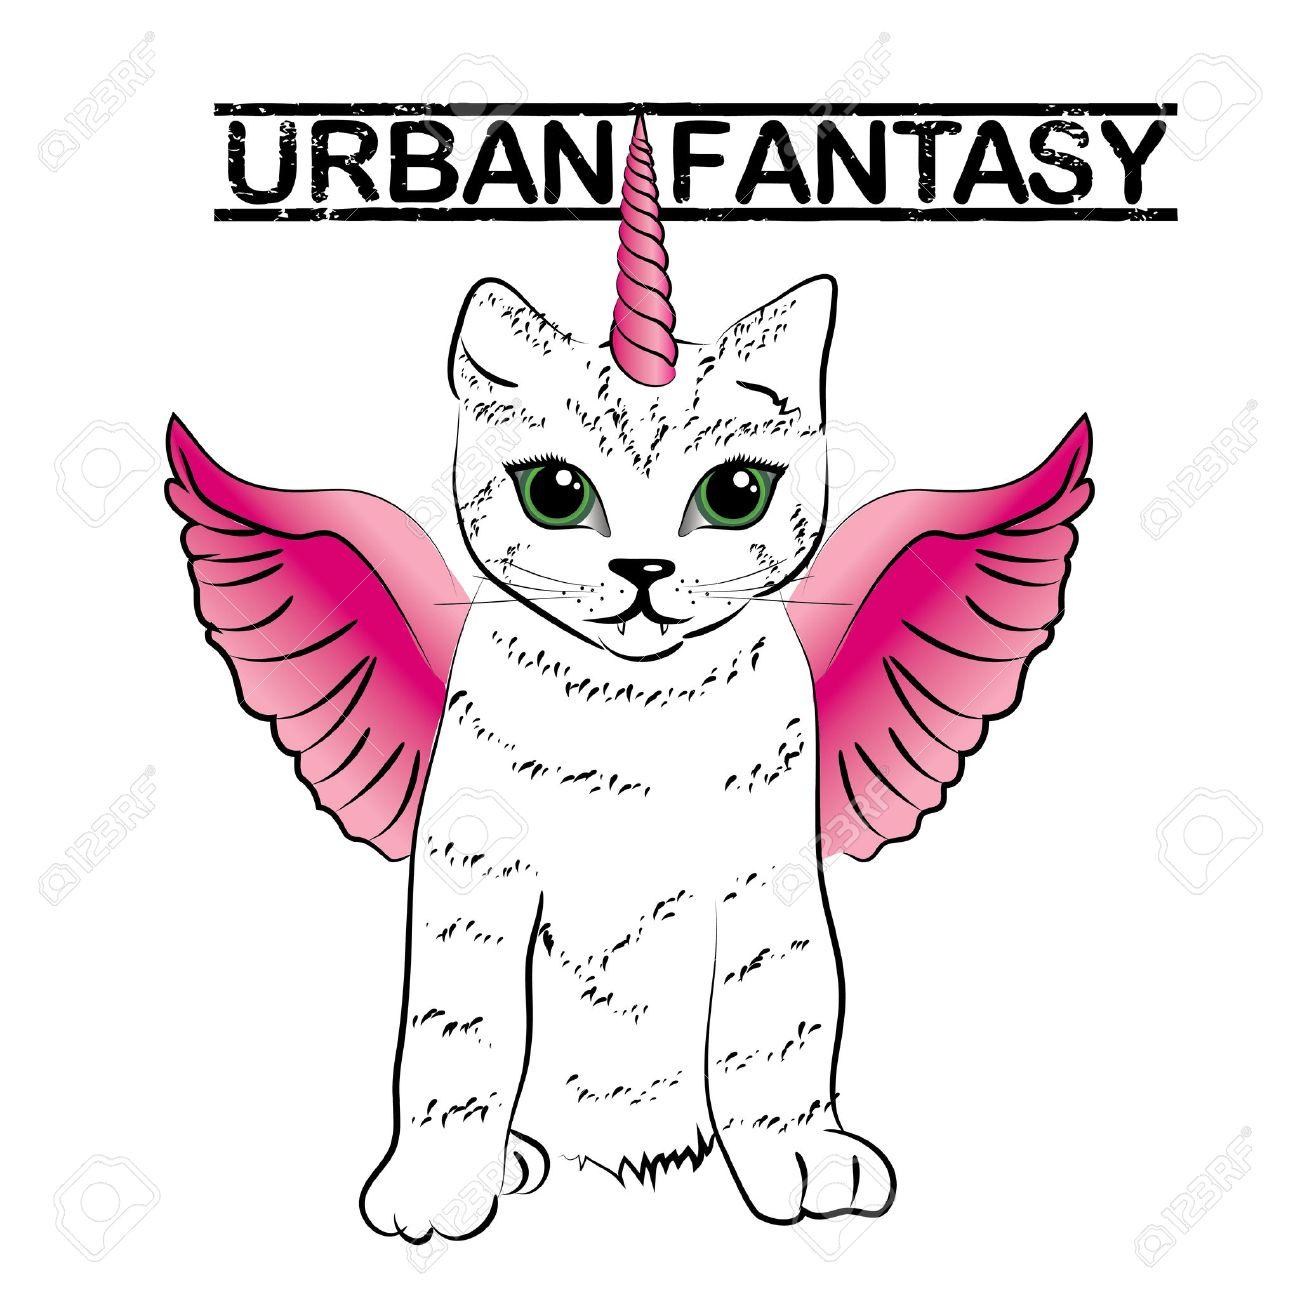 Urban fantasy - cute unicorn cats - 50969319